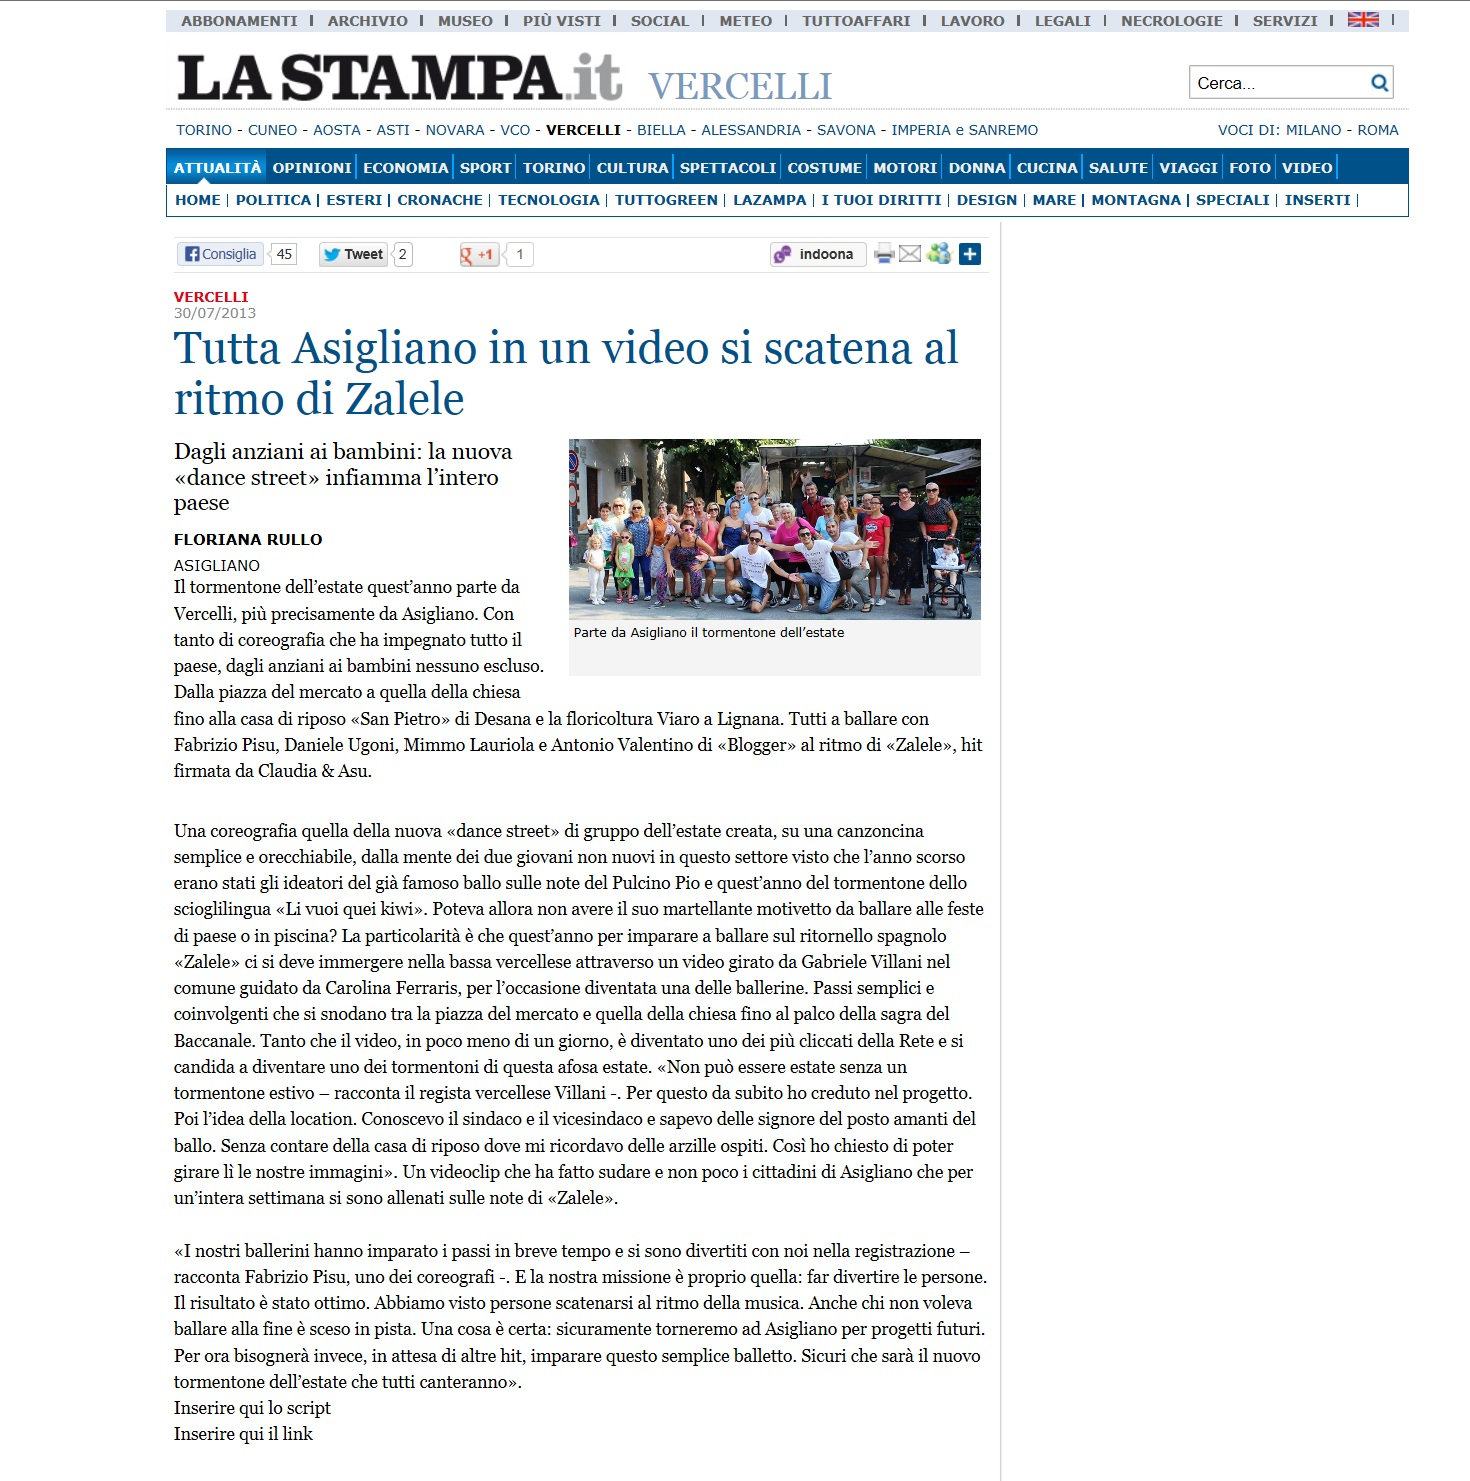 Fabrizio Pisu - La Stampa